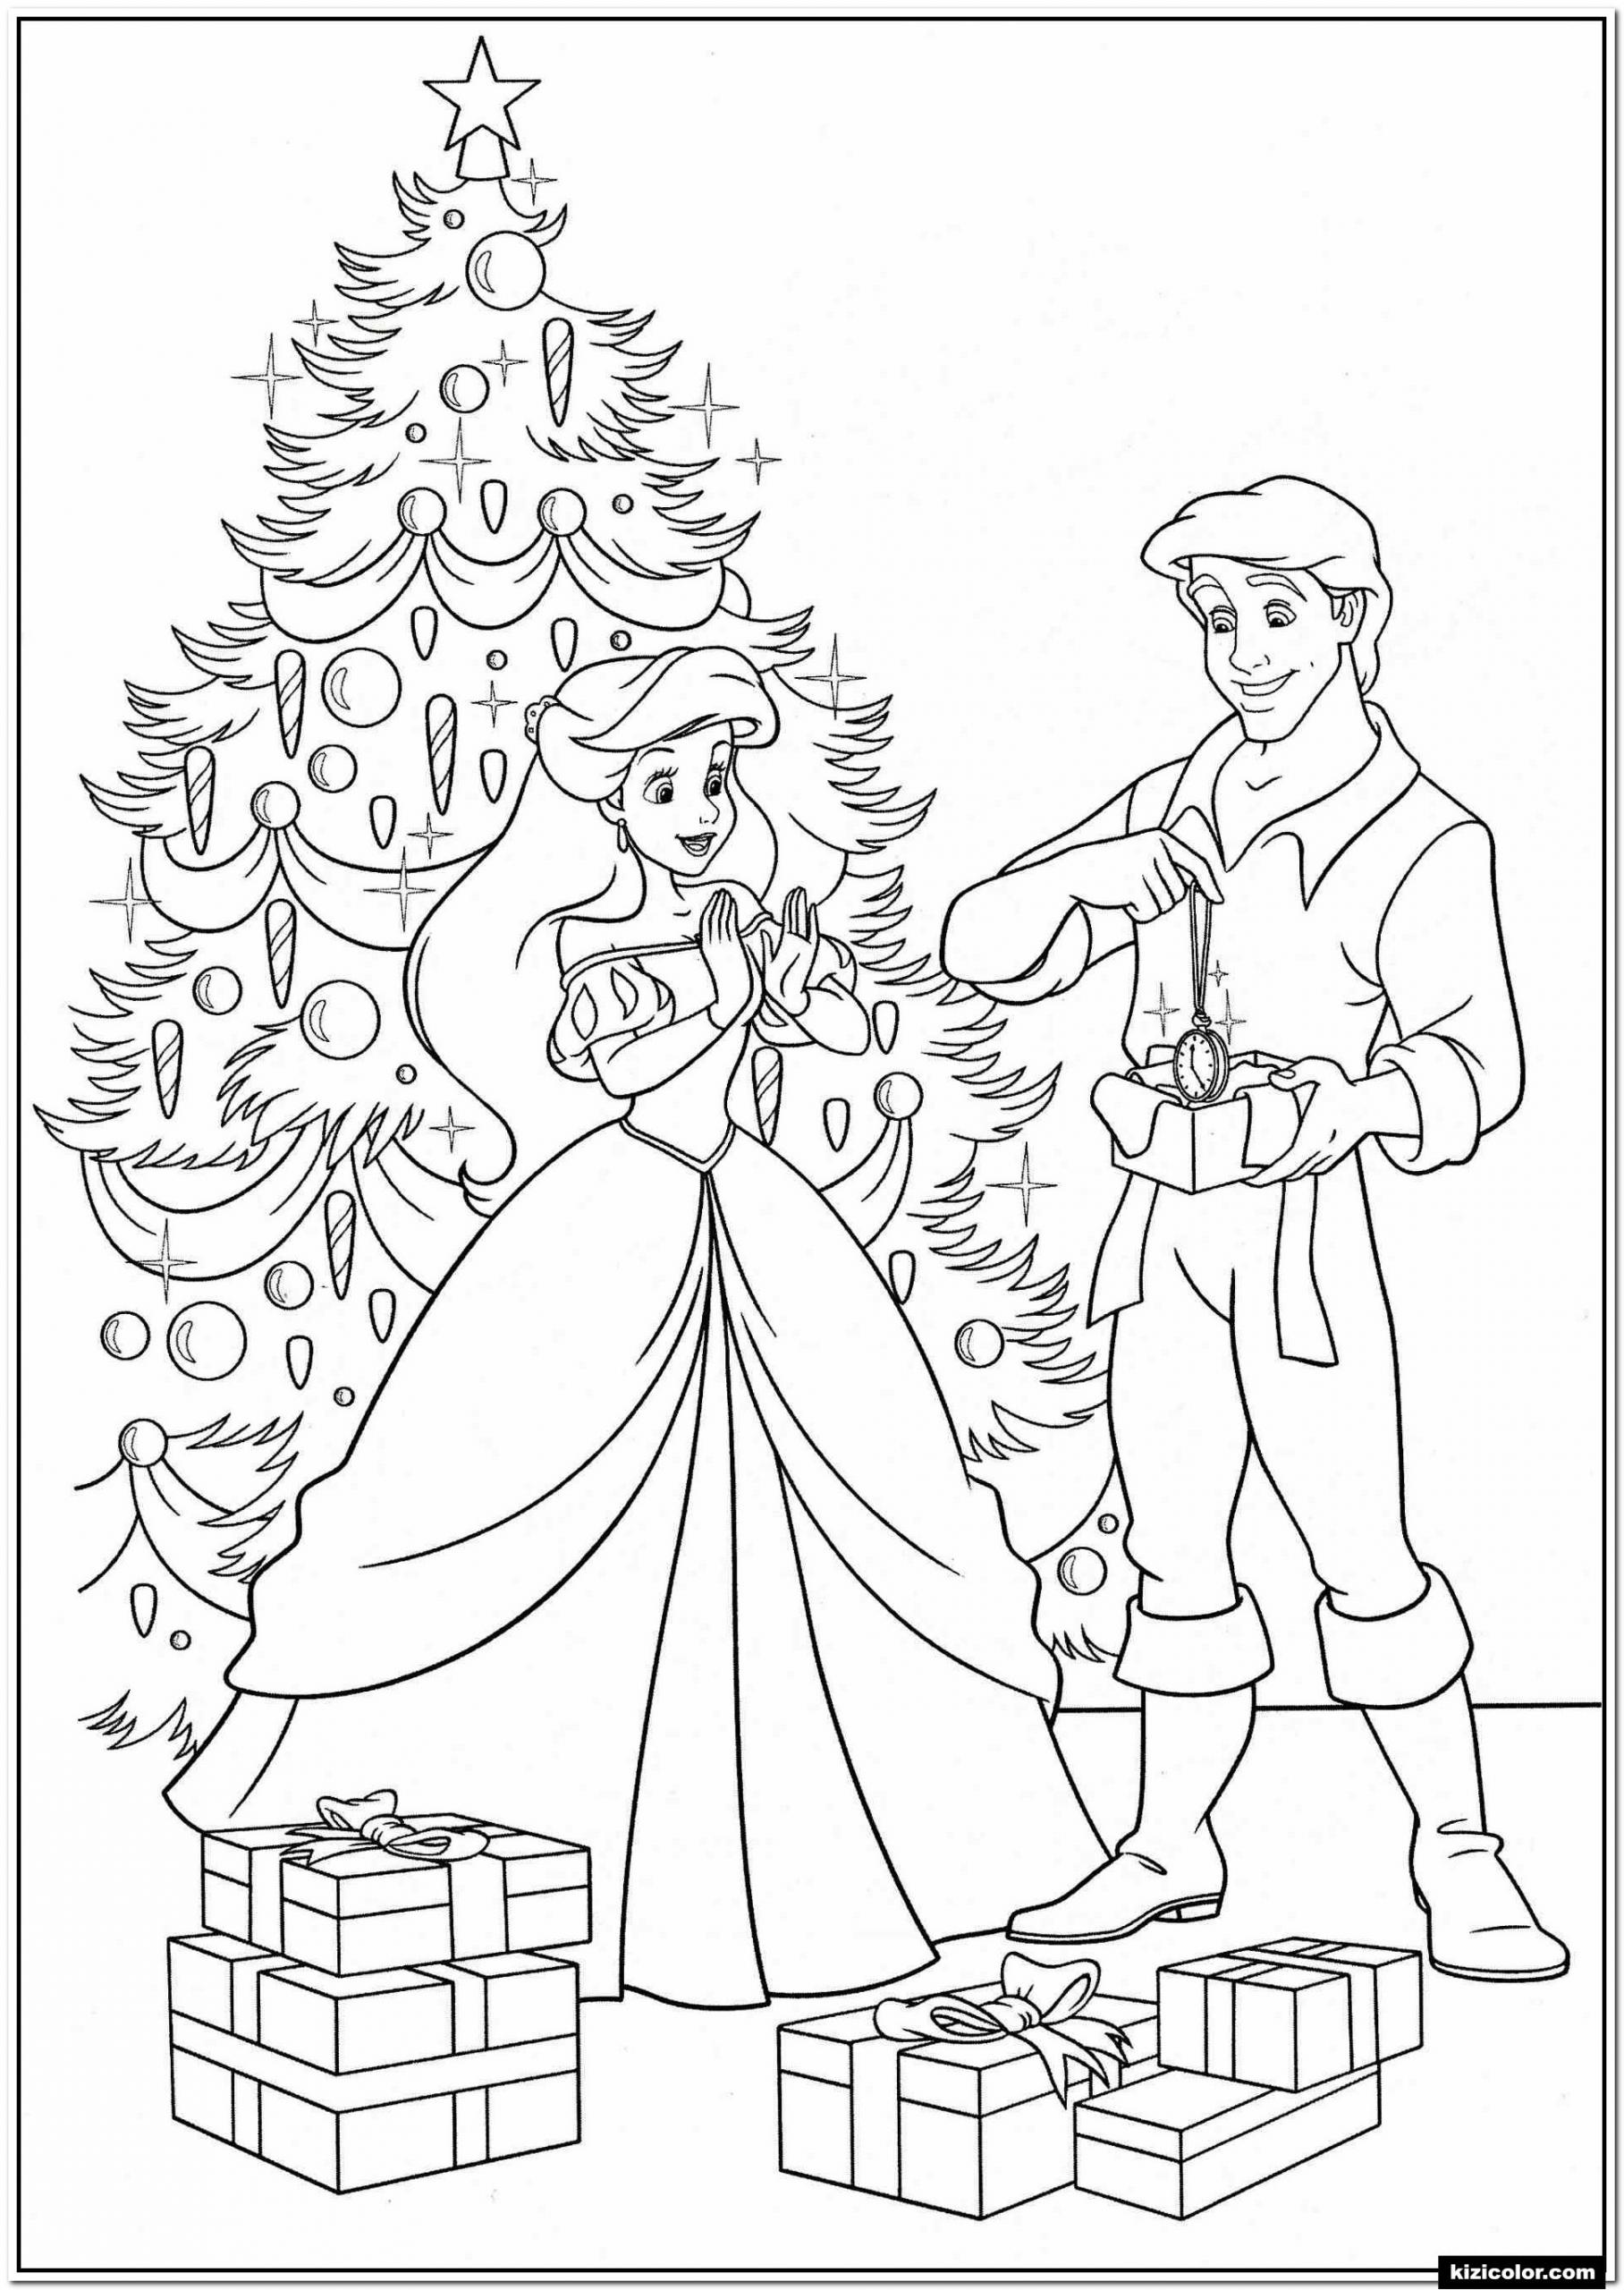 Princess Christmas Coloring Page Youngandtae Com Mermaid Coloring Pages Disney Princess Coloring Pages Princess Coloring Pages